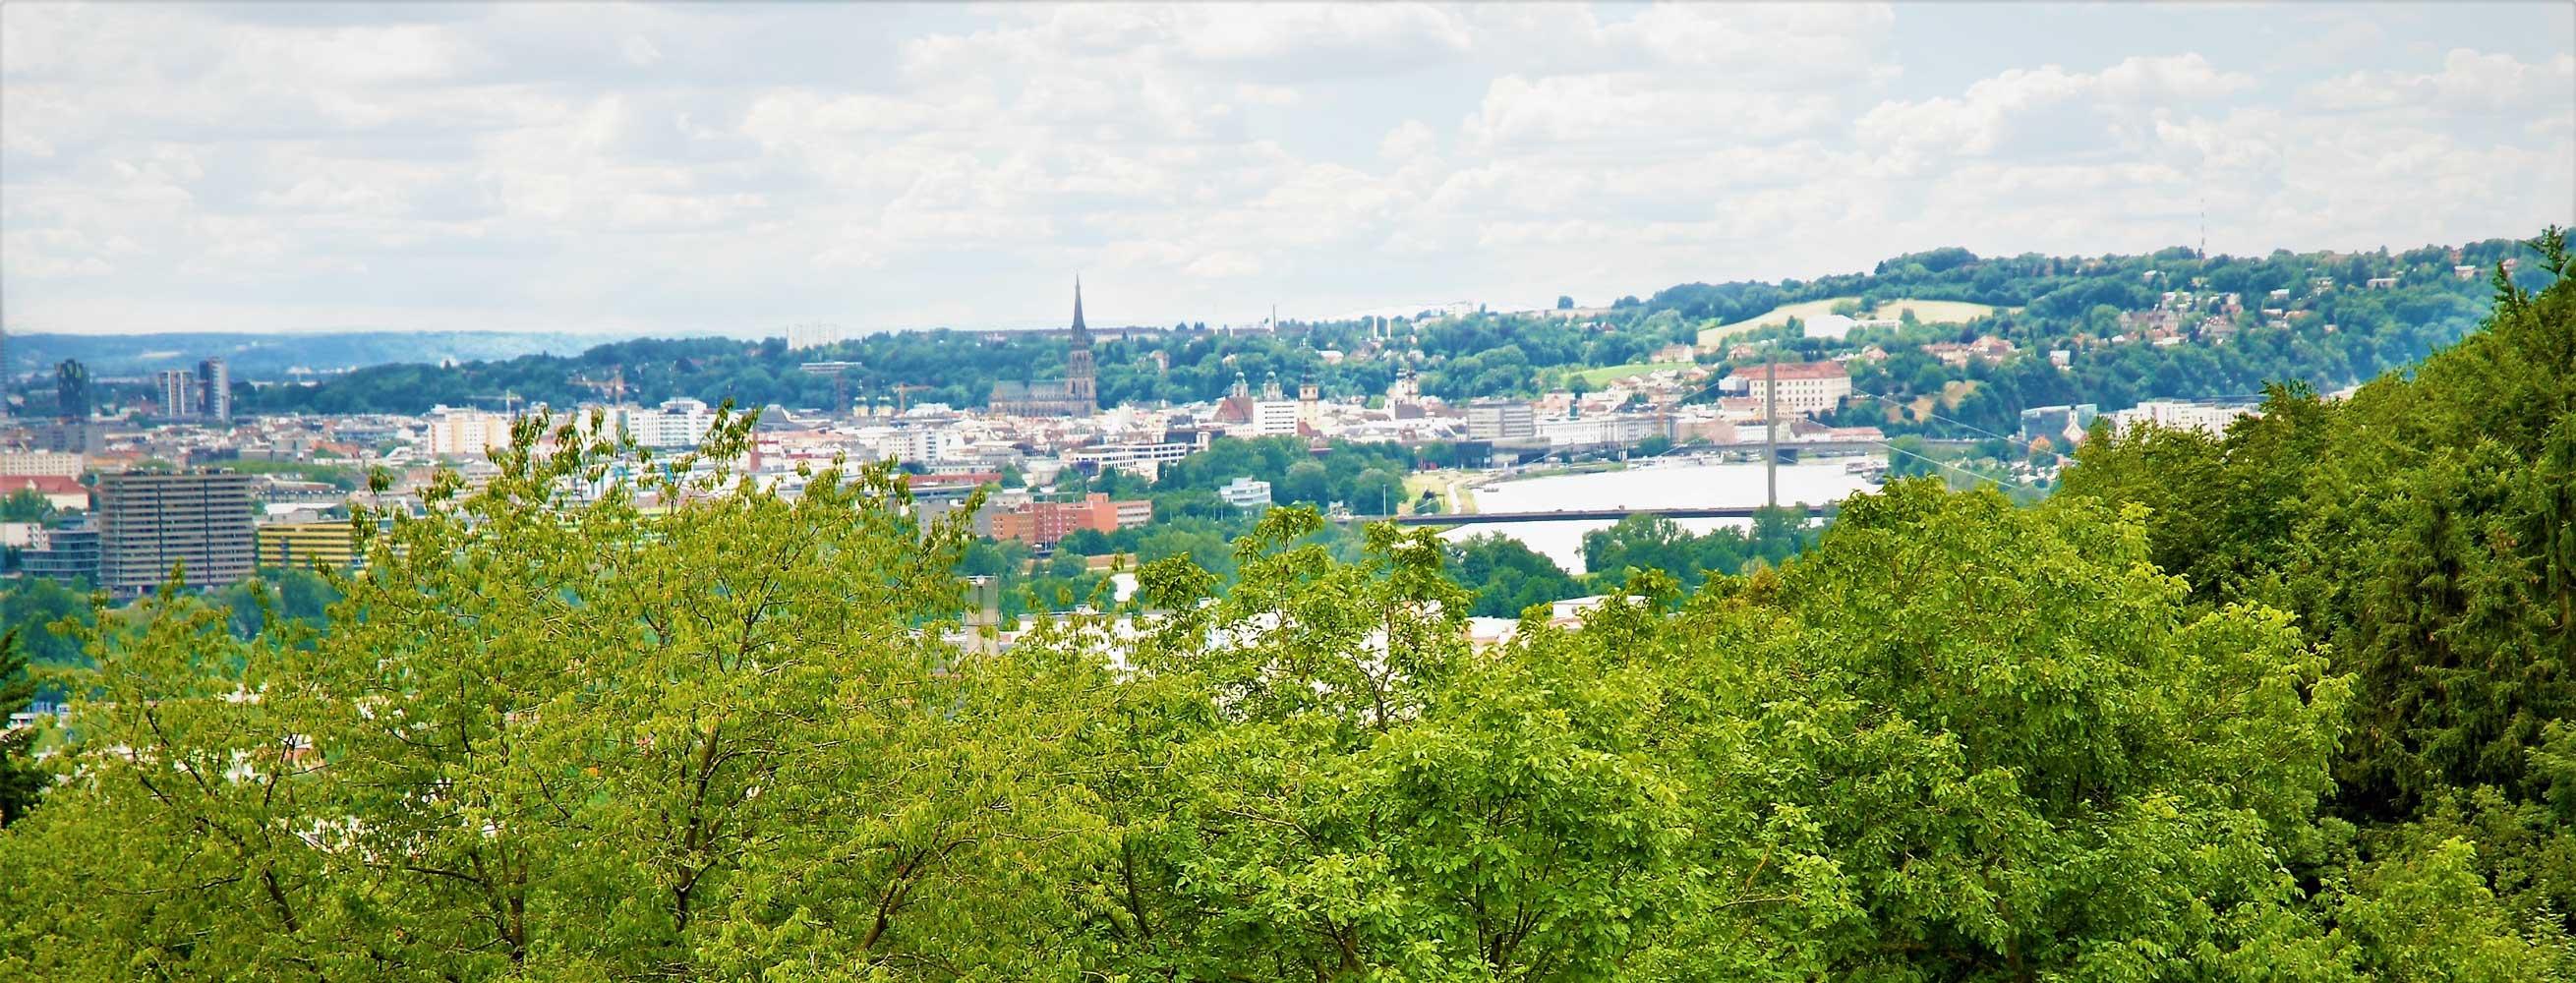 Linz Surrounding